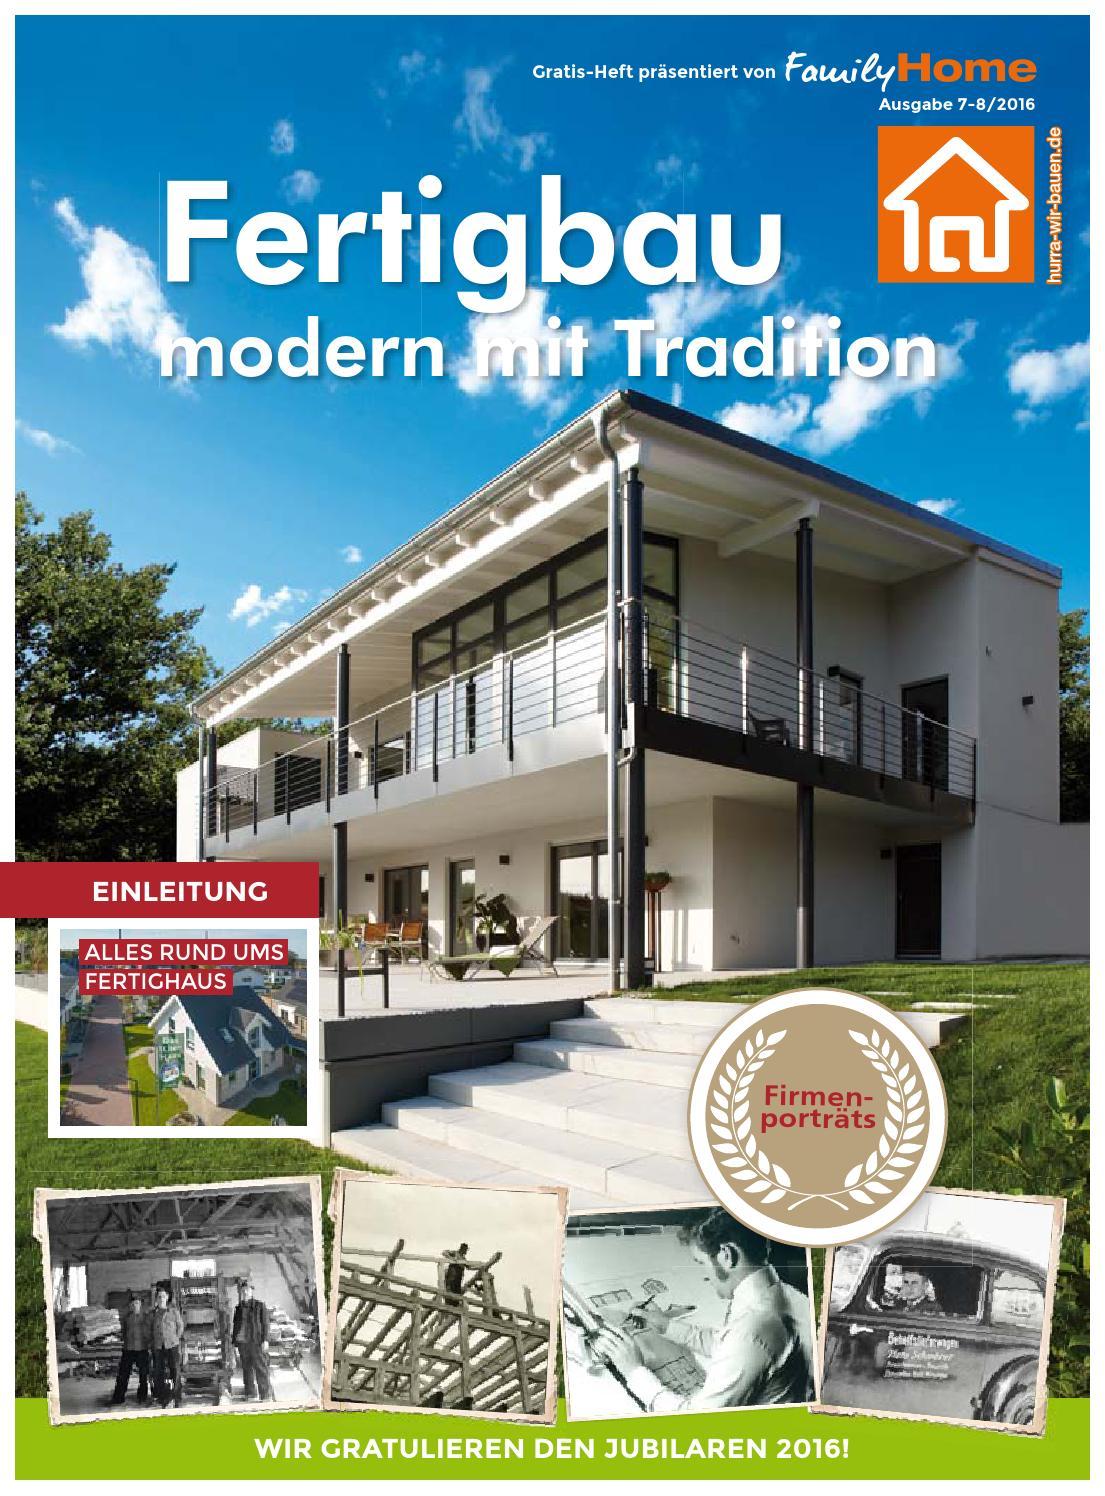 ^ Heft im Heft: Fertigbau 2016 by Family Home Verlag GmbH - issuu